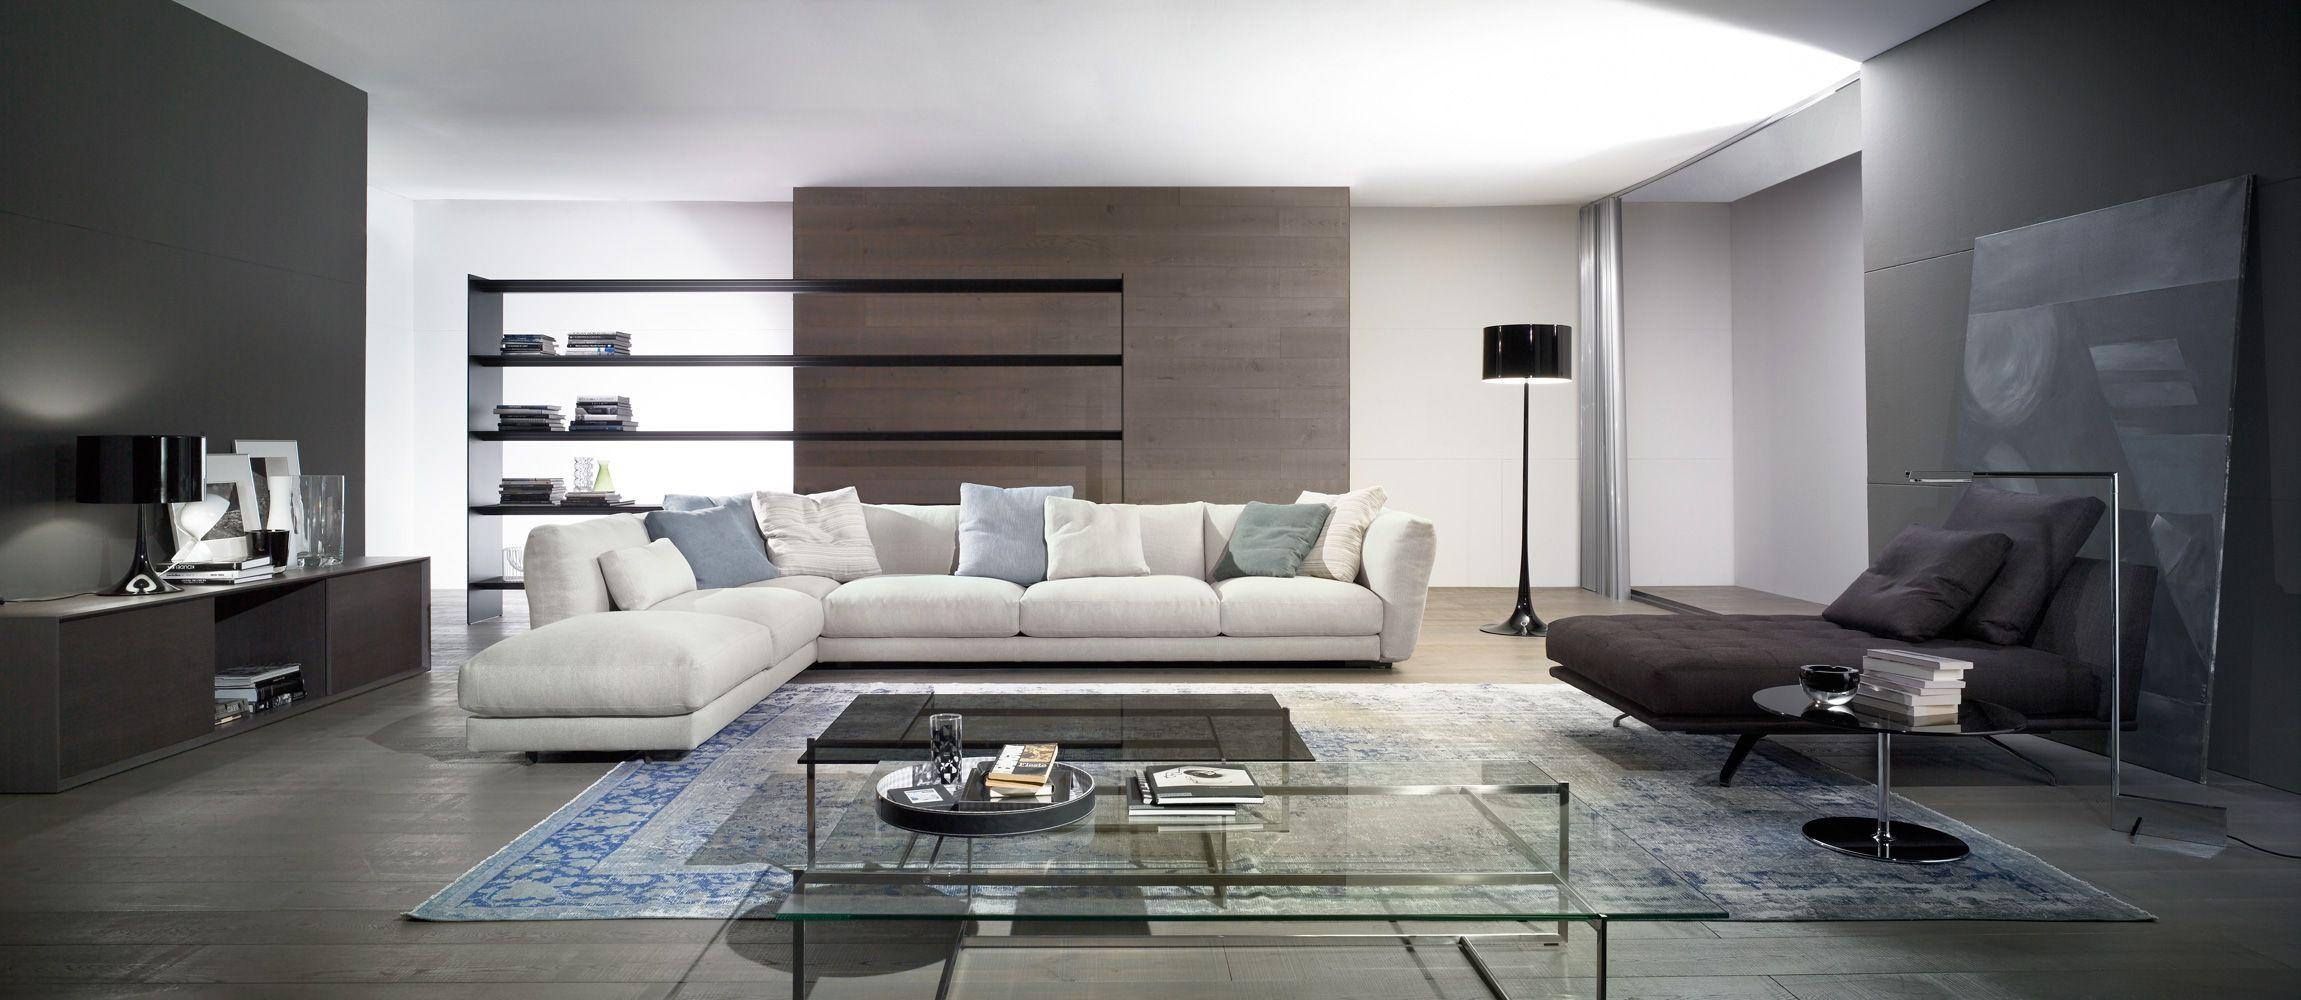 Casades S Furniture Design Barcelona Form Collection Sofas  # Muebles De Casa Barcelona